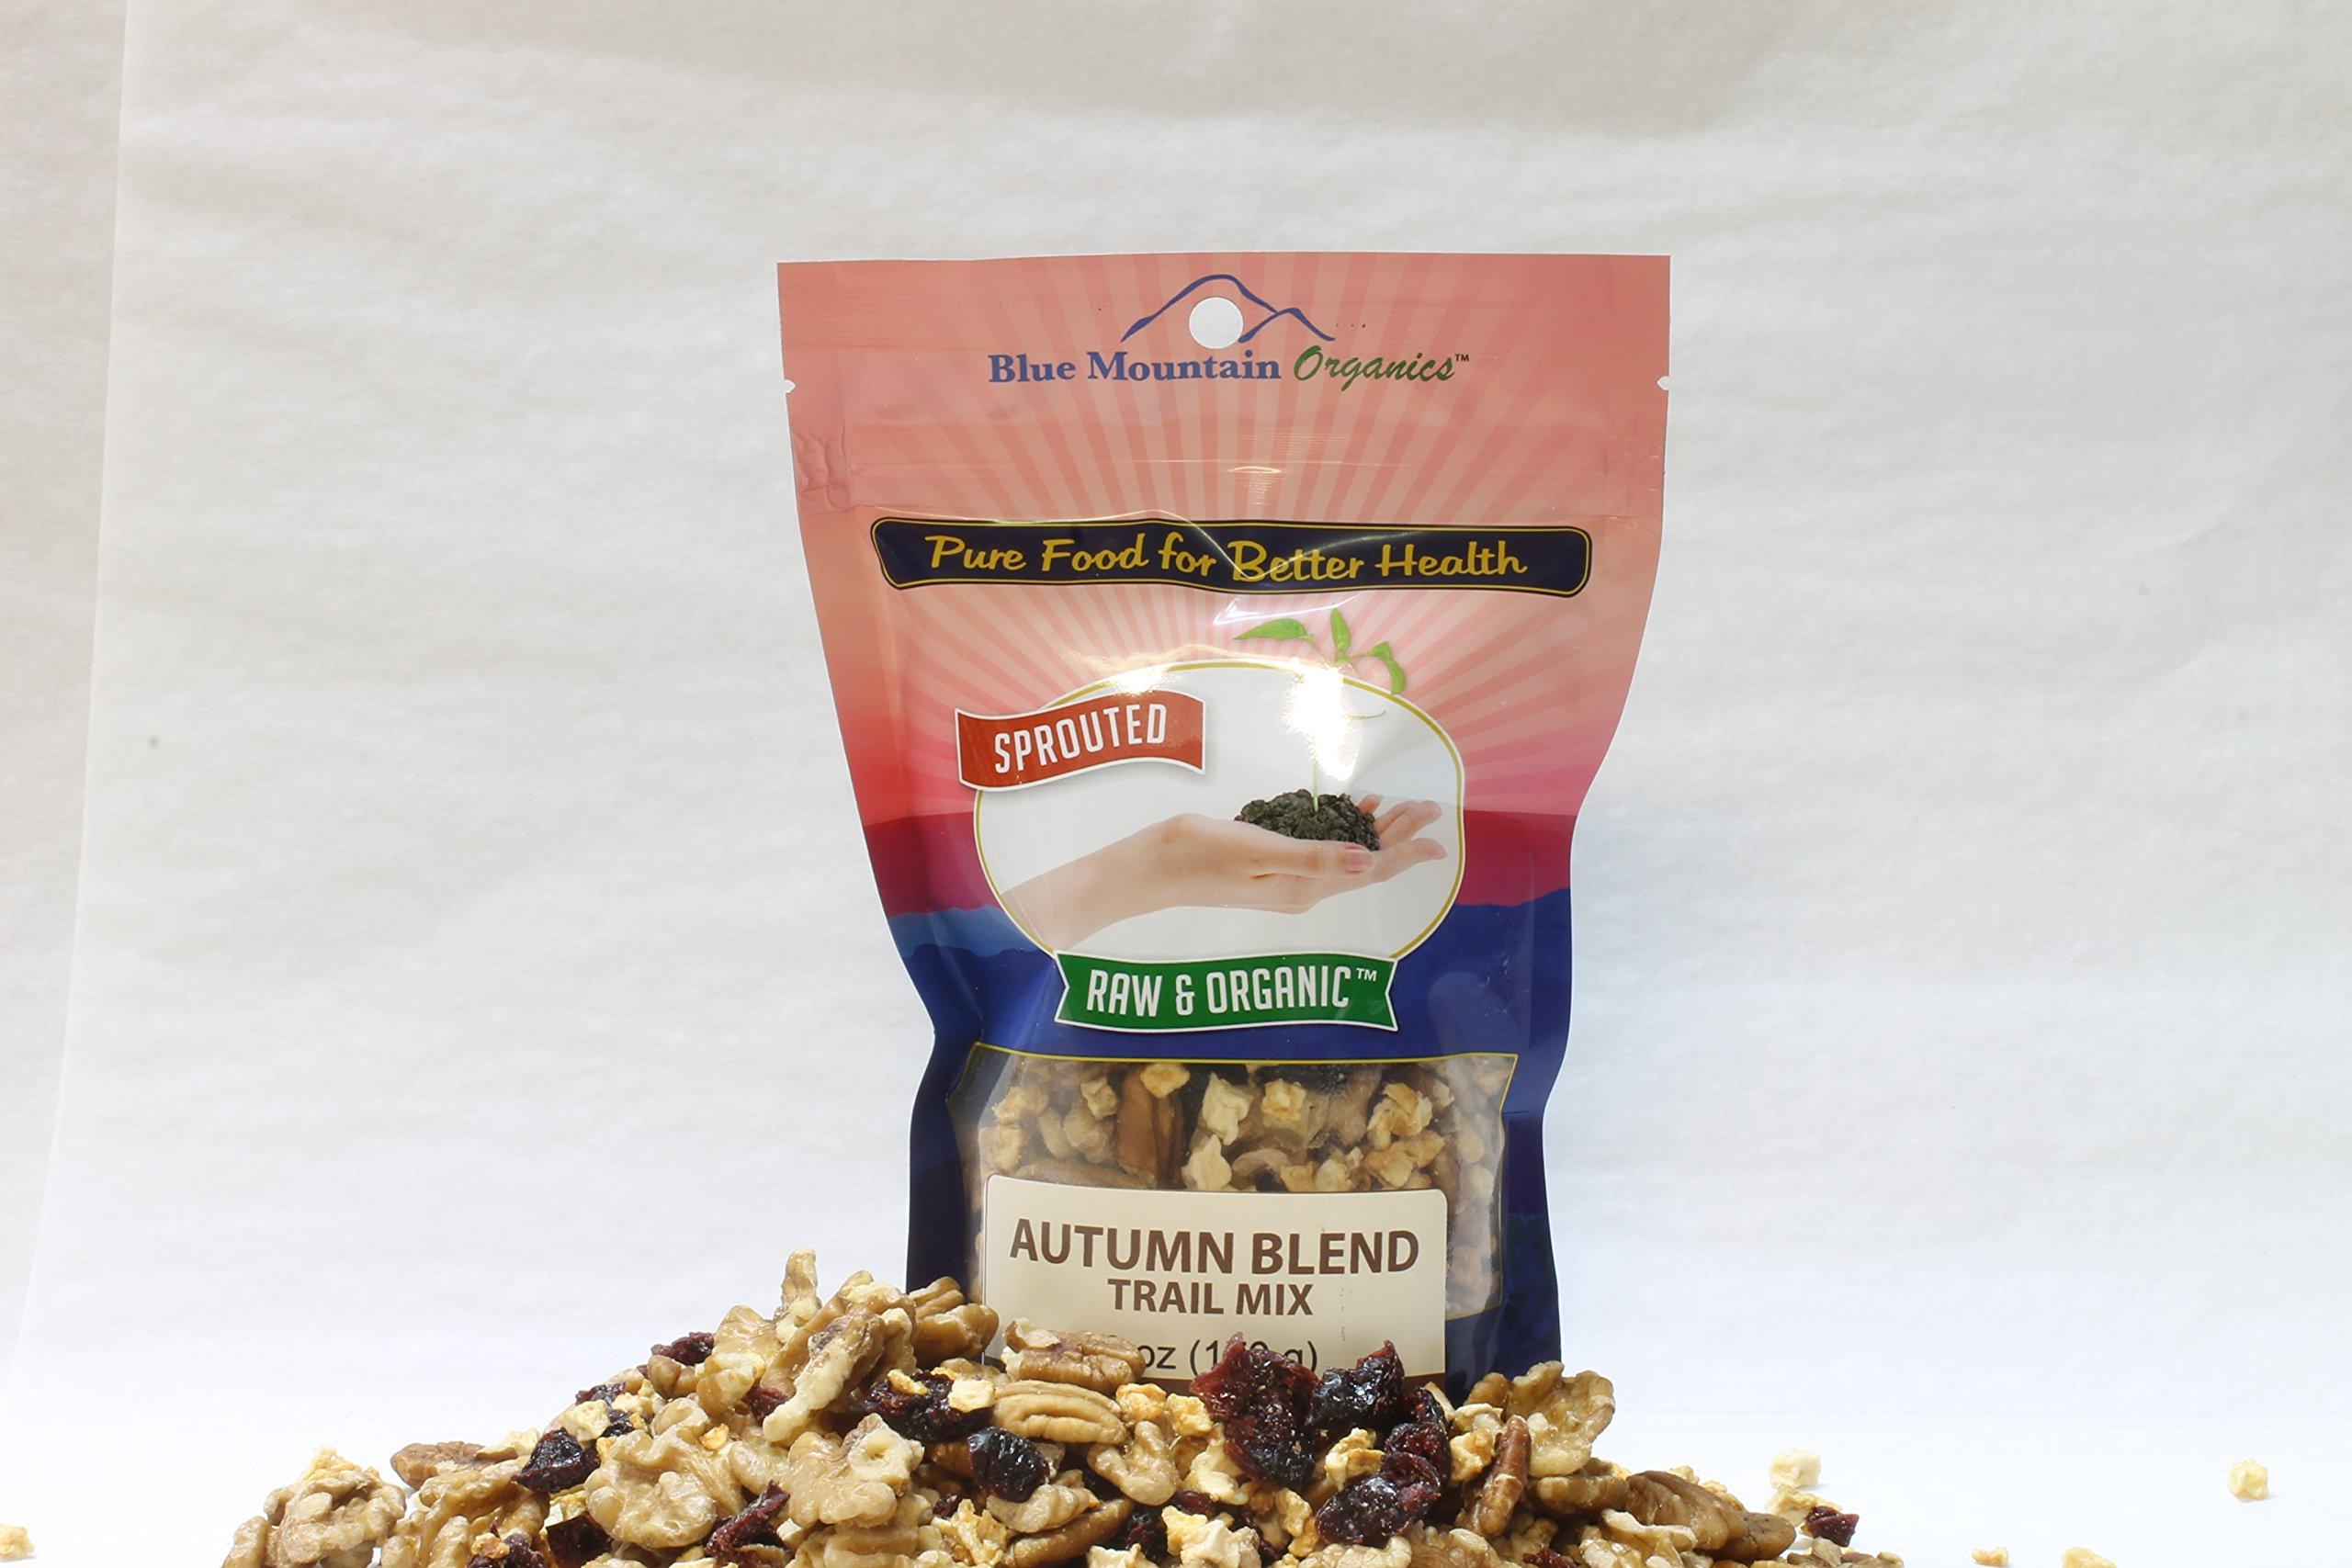 Blue Mountain Organics, Raw, Vegan, Paleo, Organic, Sprouted, Autumn Blend Trail Mix, (Pack of 3) 18 oz